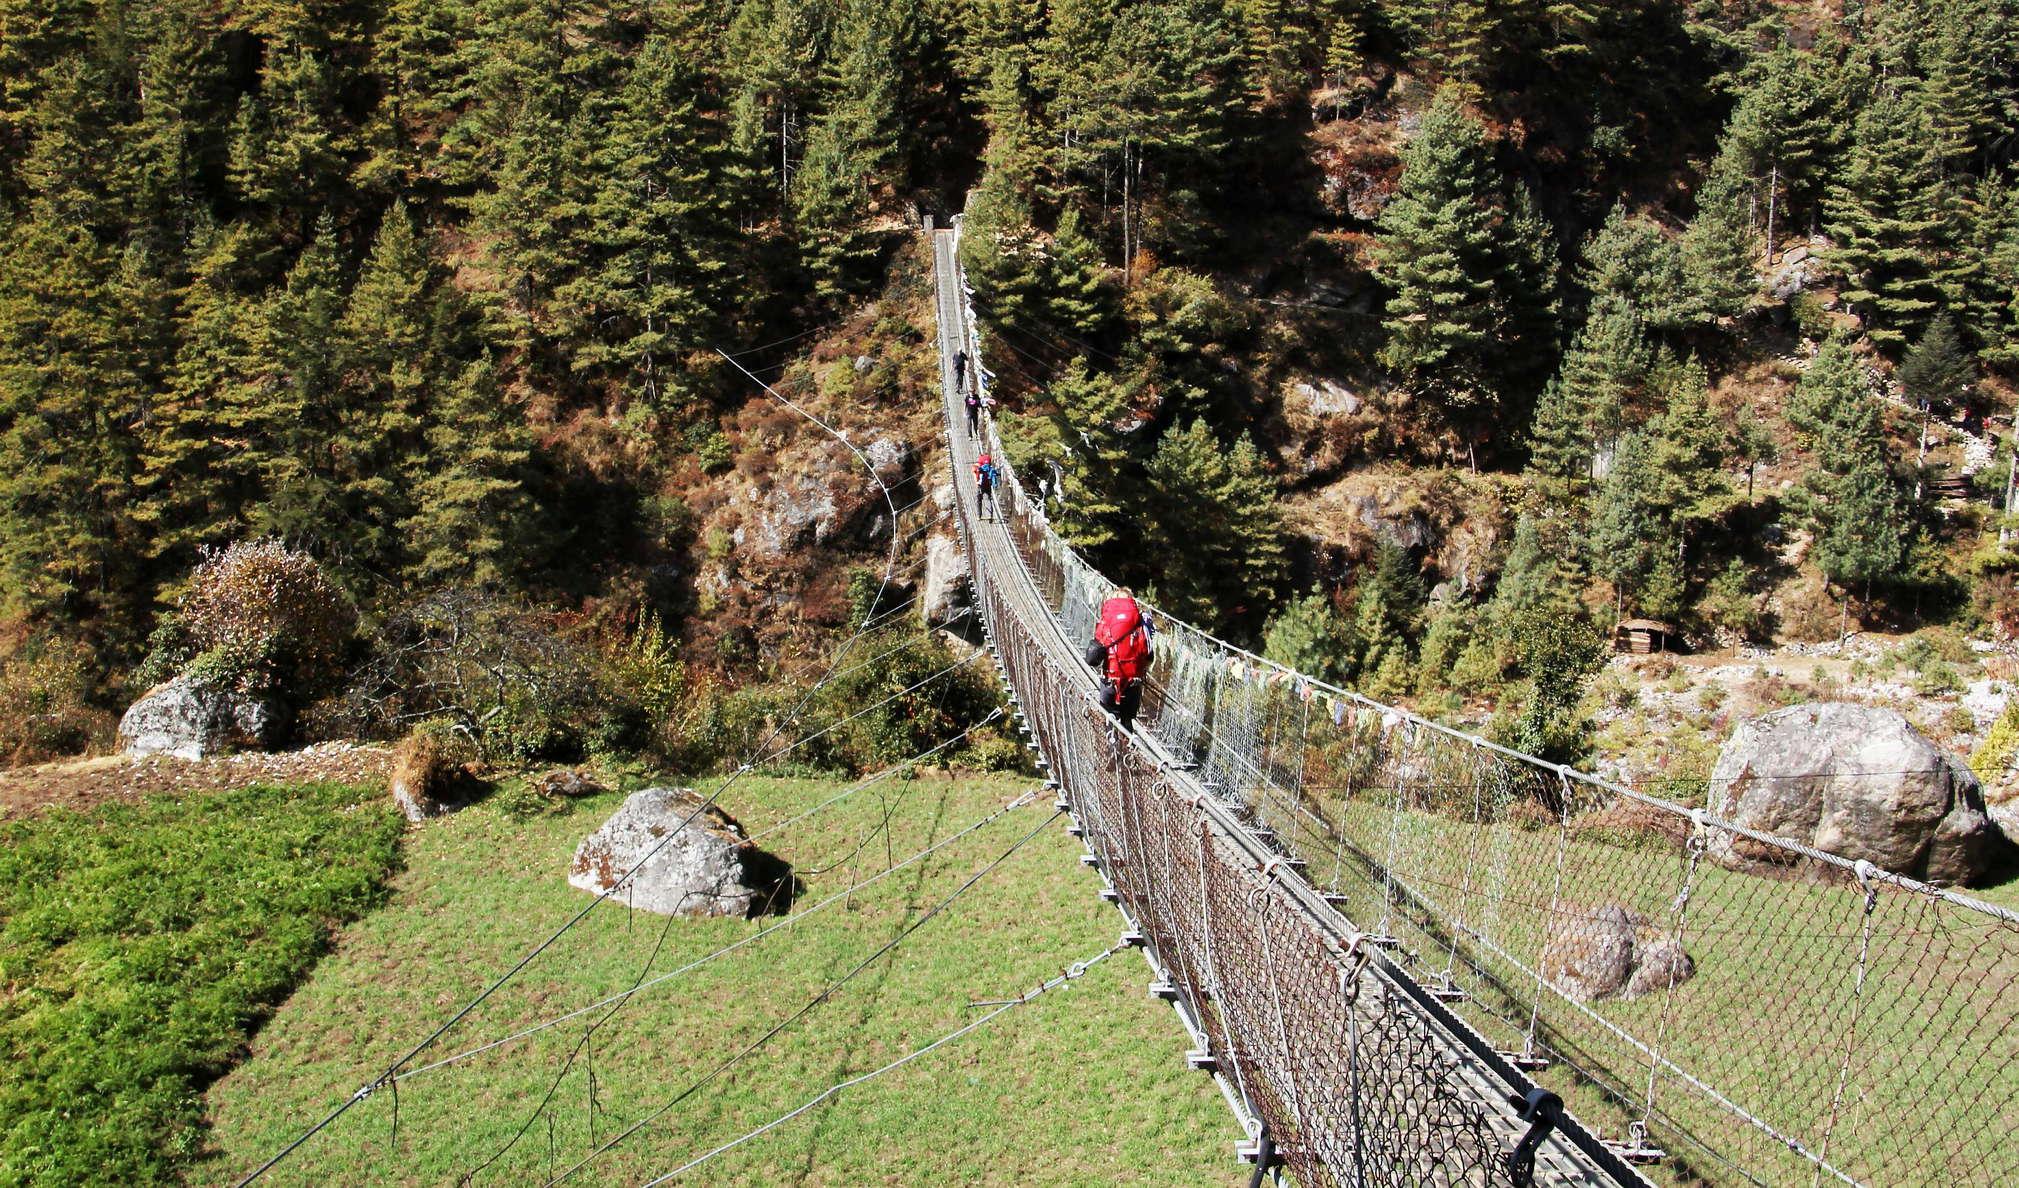 Jorsalle | Suspension bridge | The world in images